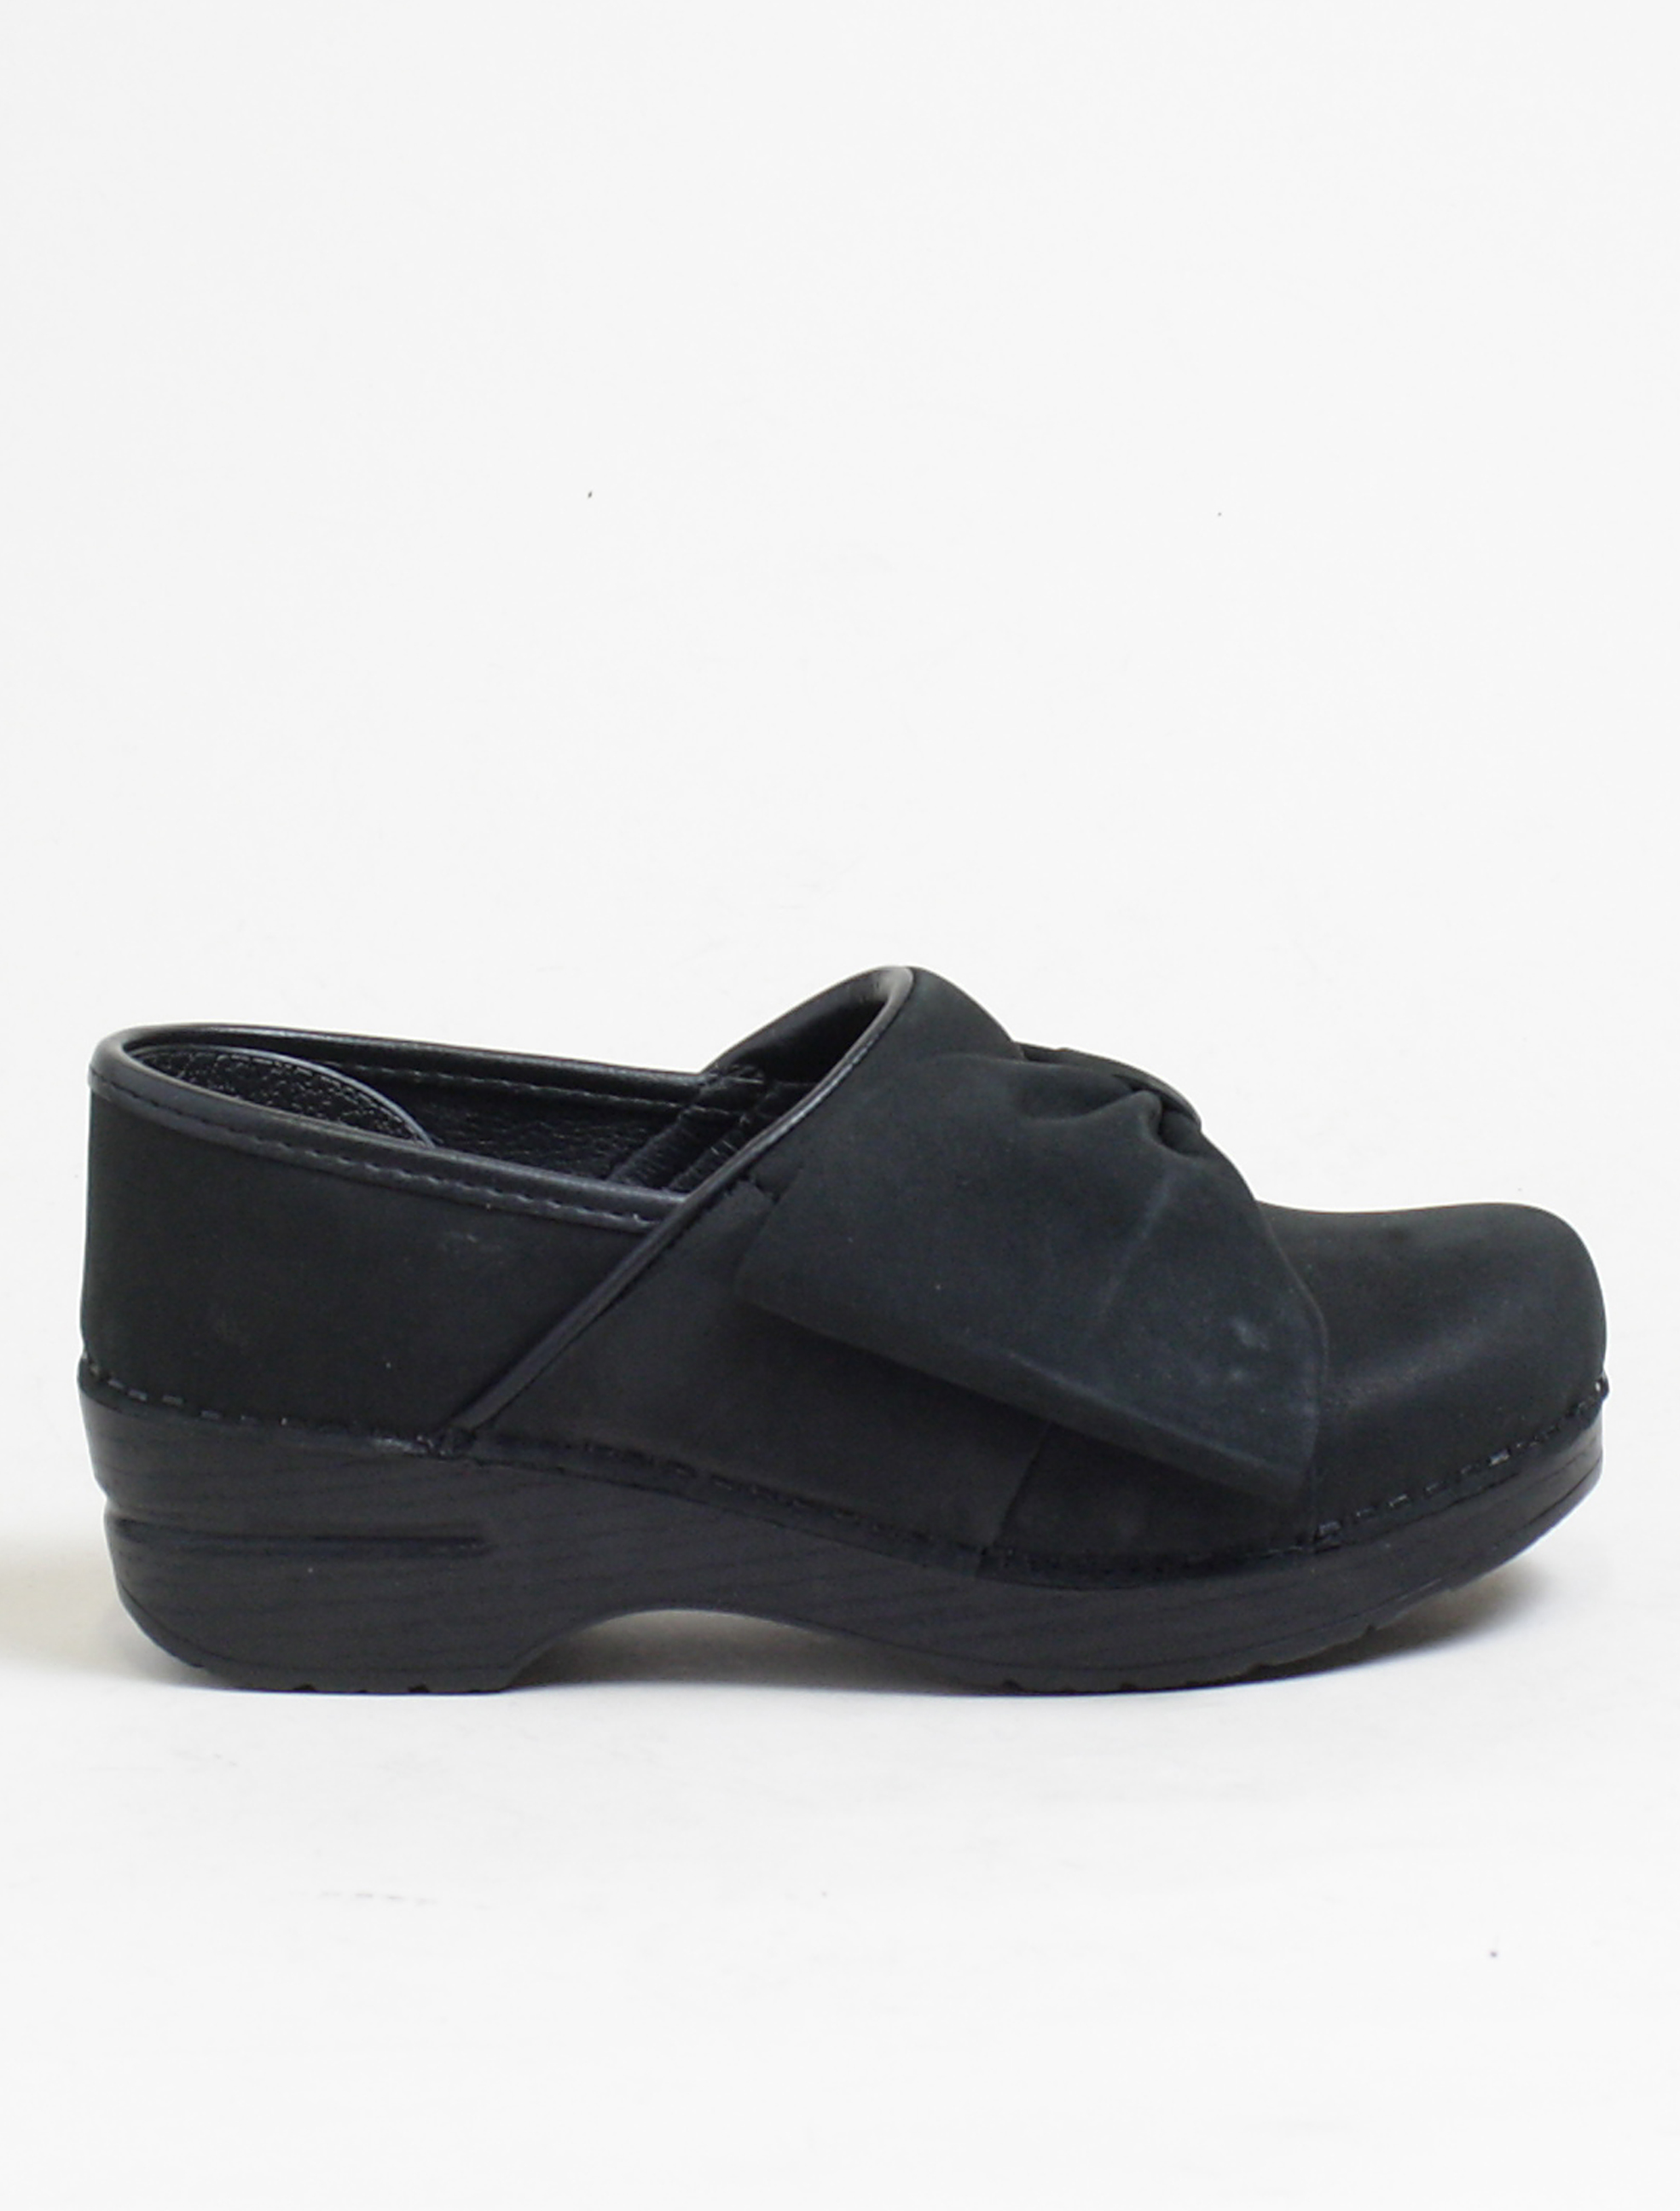 Dansko Pro Bow Black Nubuk